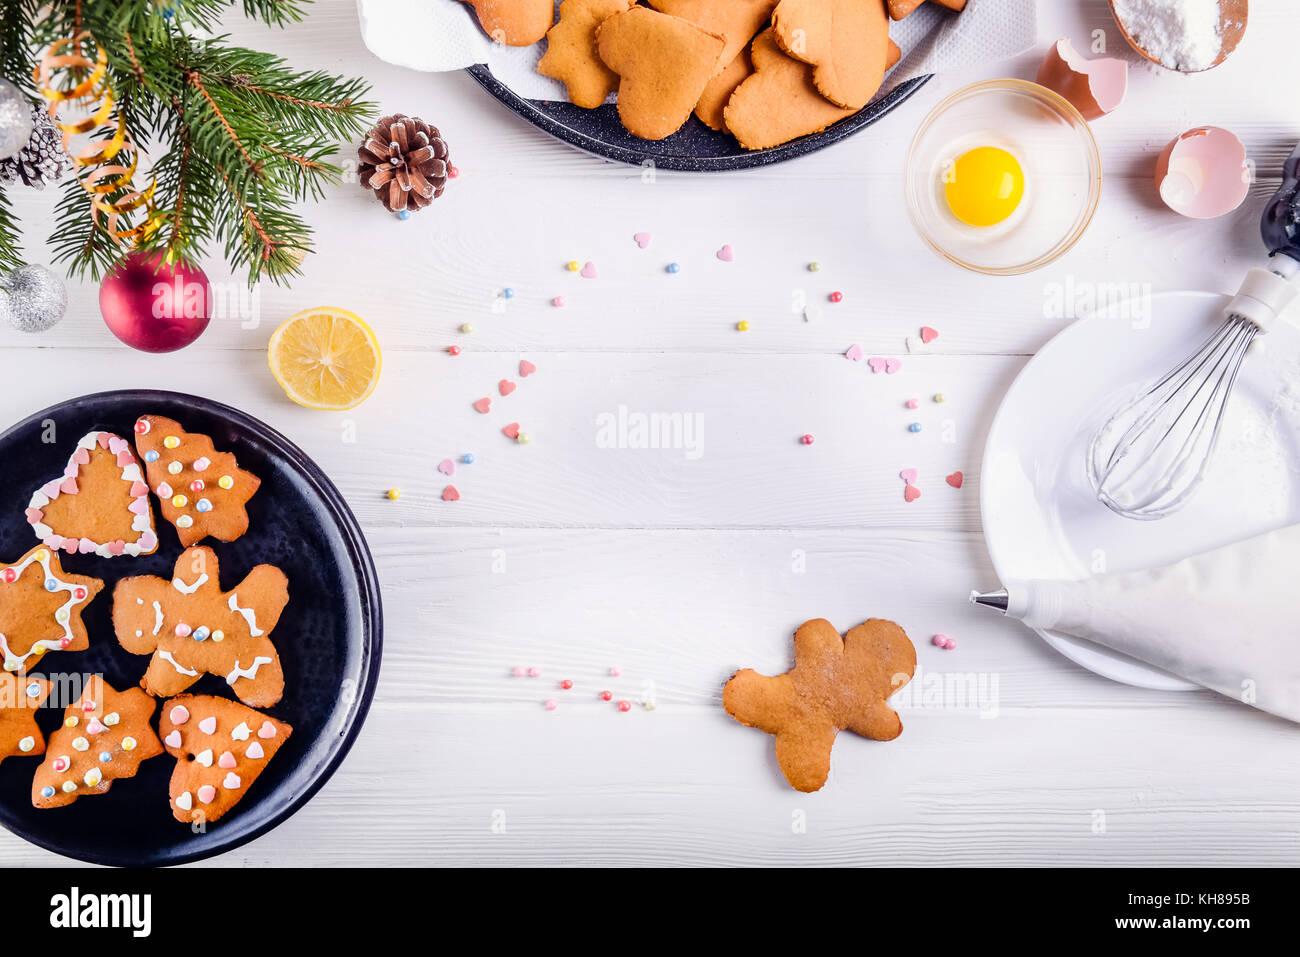 Retro Christmas Party Stockfotos & Retro Christmas Party Bilder - Alamy